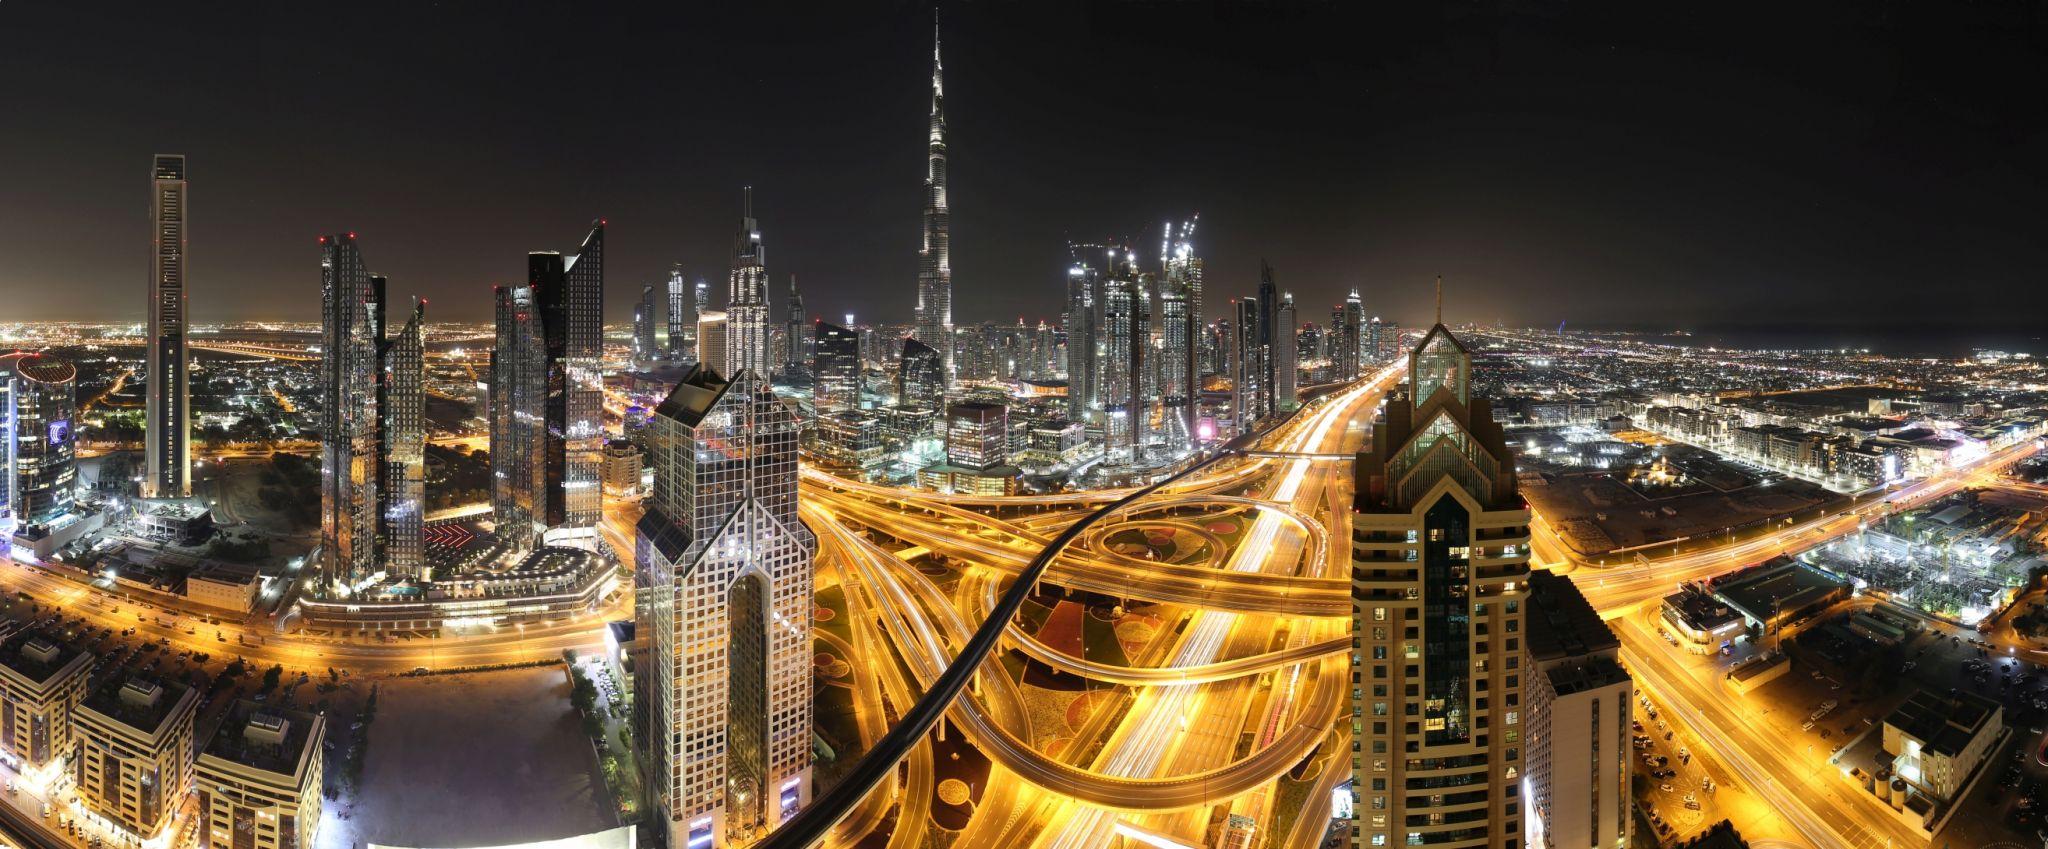 Shangri La Hotel, Floor 42, United Arab Emirates